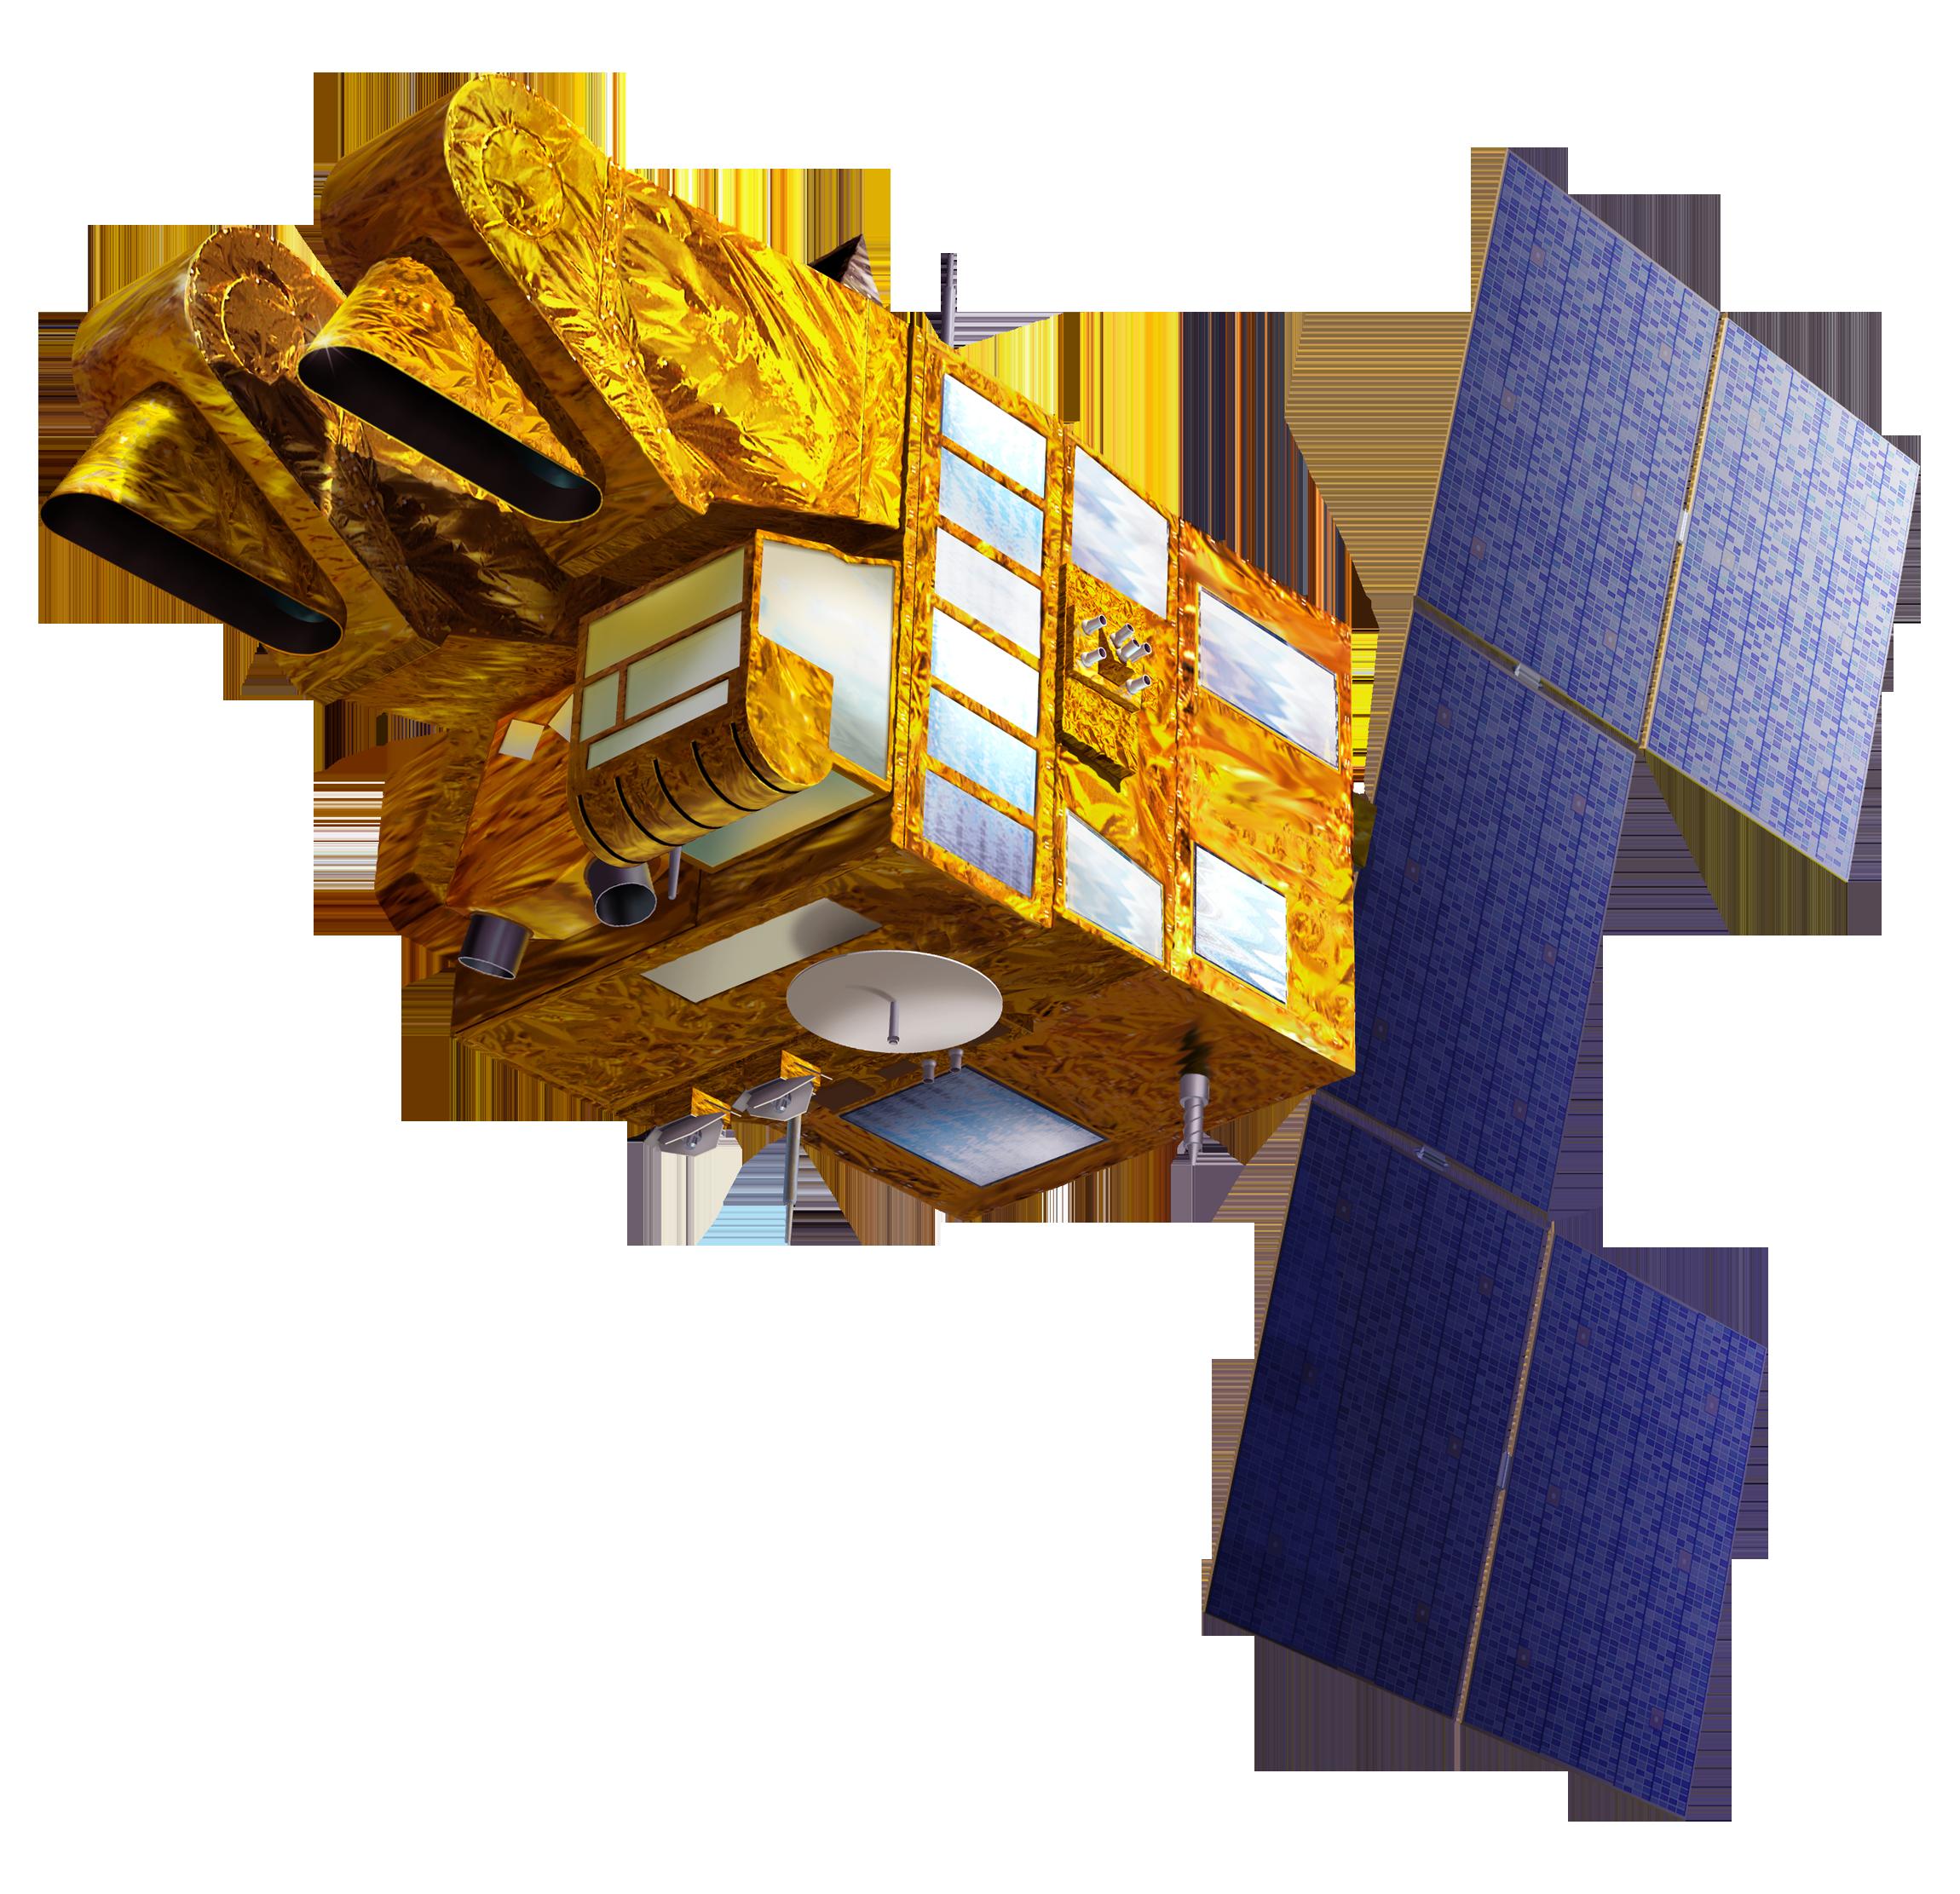 Satellite Transparent Png Image - Satellite, Transparent background PNG HD thumbnail